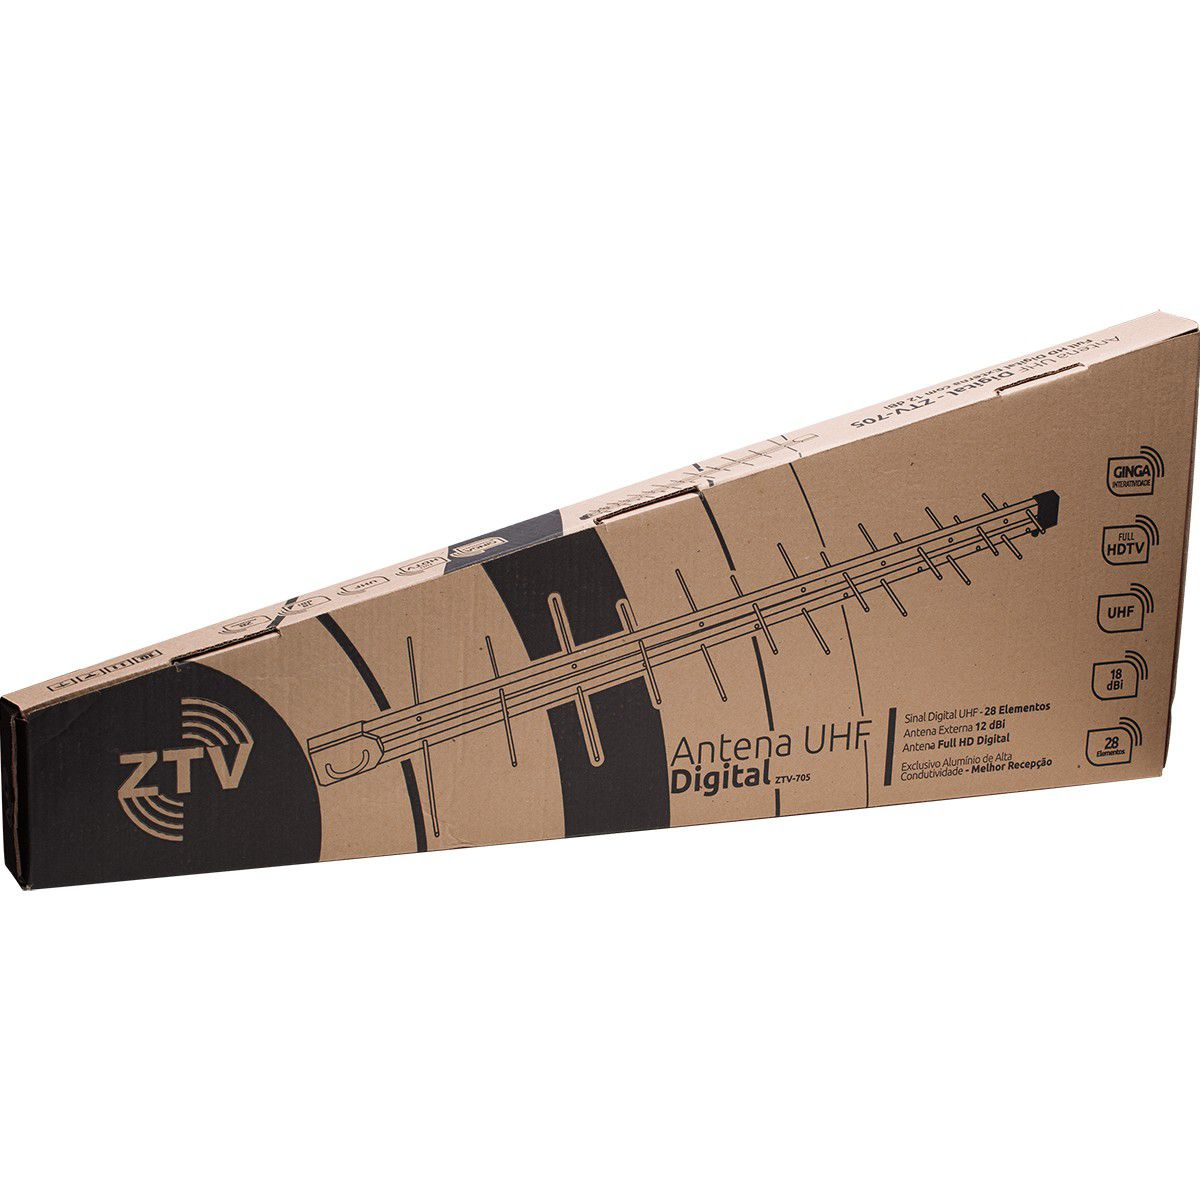 ANTENA DE TV DIGITAL - 28 ELEMENTOS - ZTV-705